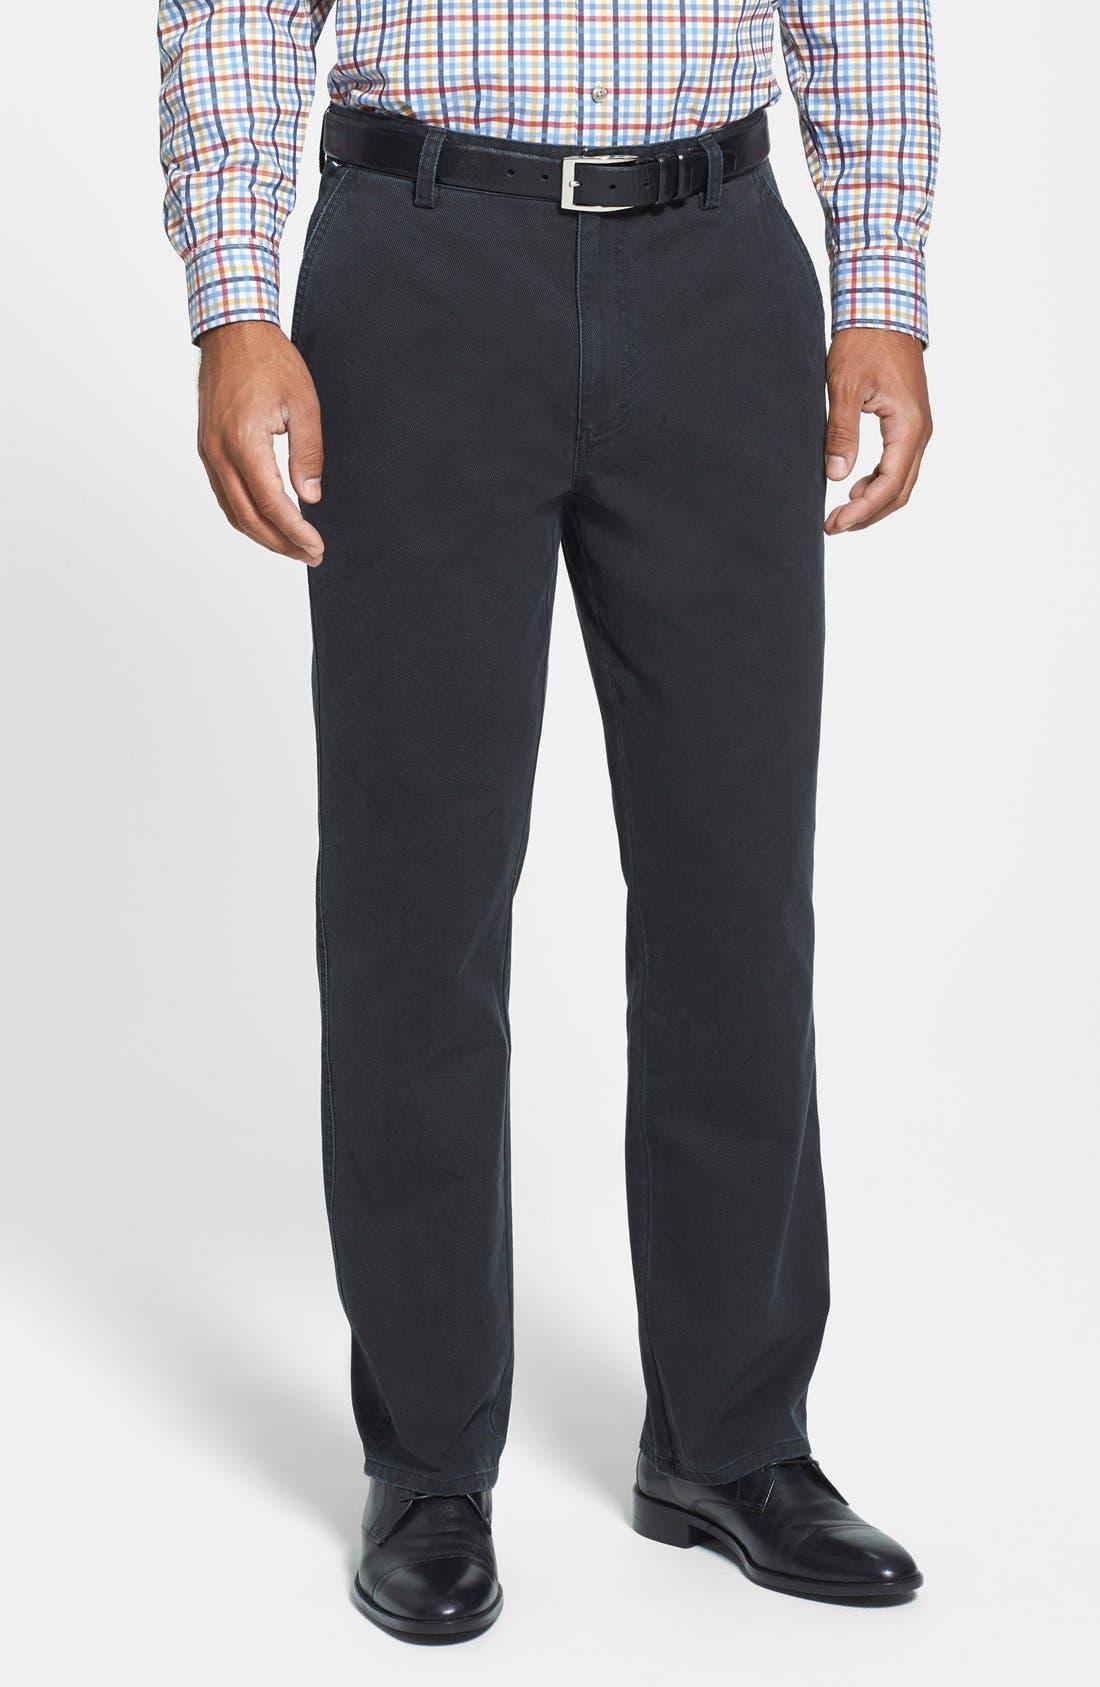 Cutter & Buck Curtis Flat Front Five-Pocket Cotton Twill Pants